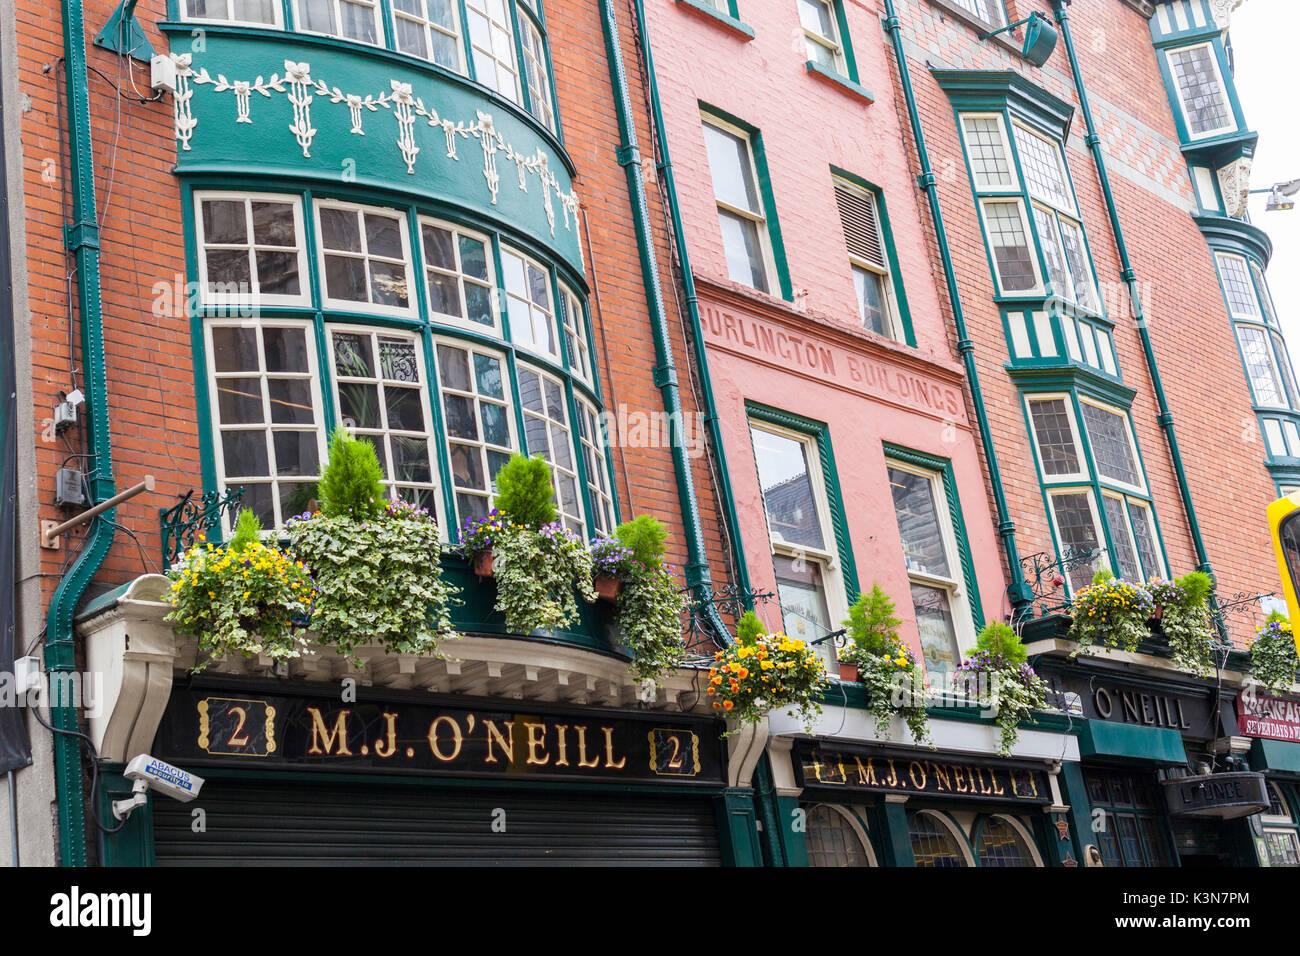 Historical buildings in Dublin, Leinster, Ireland, Europe. - Stock Image